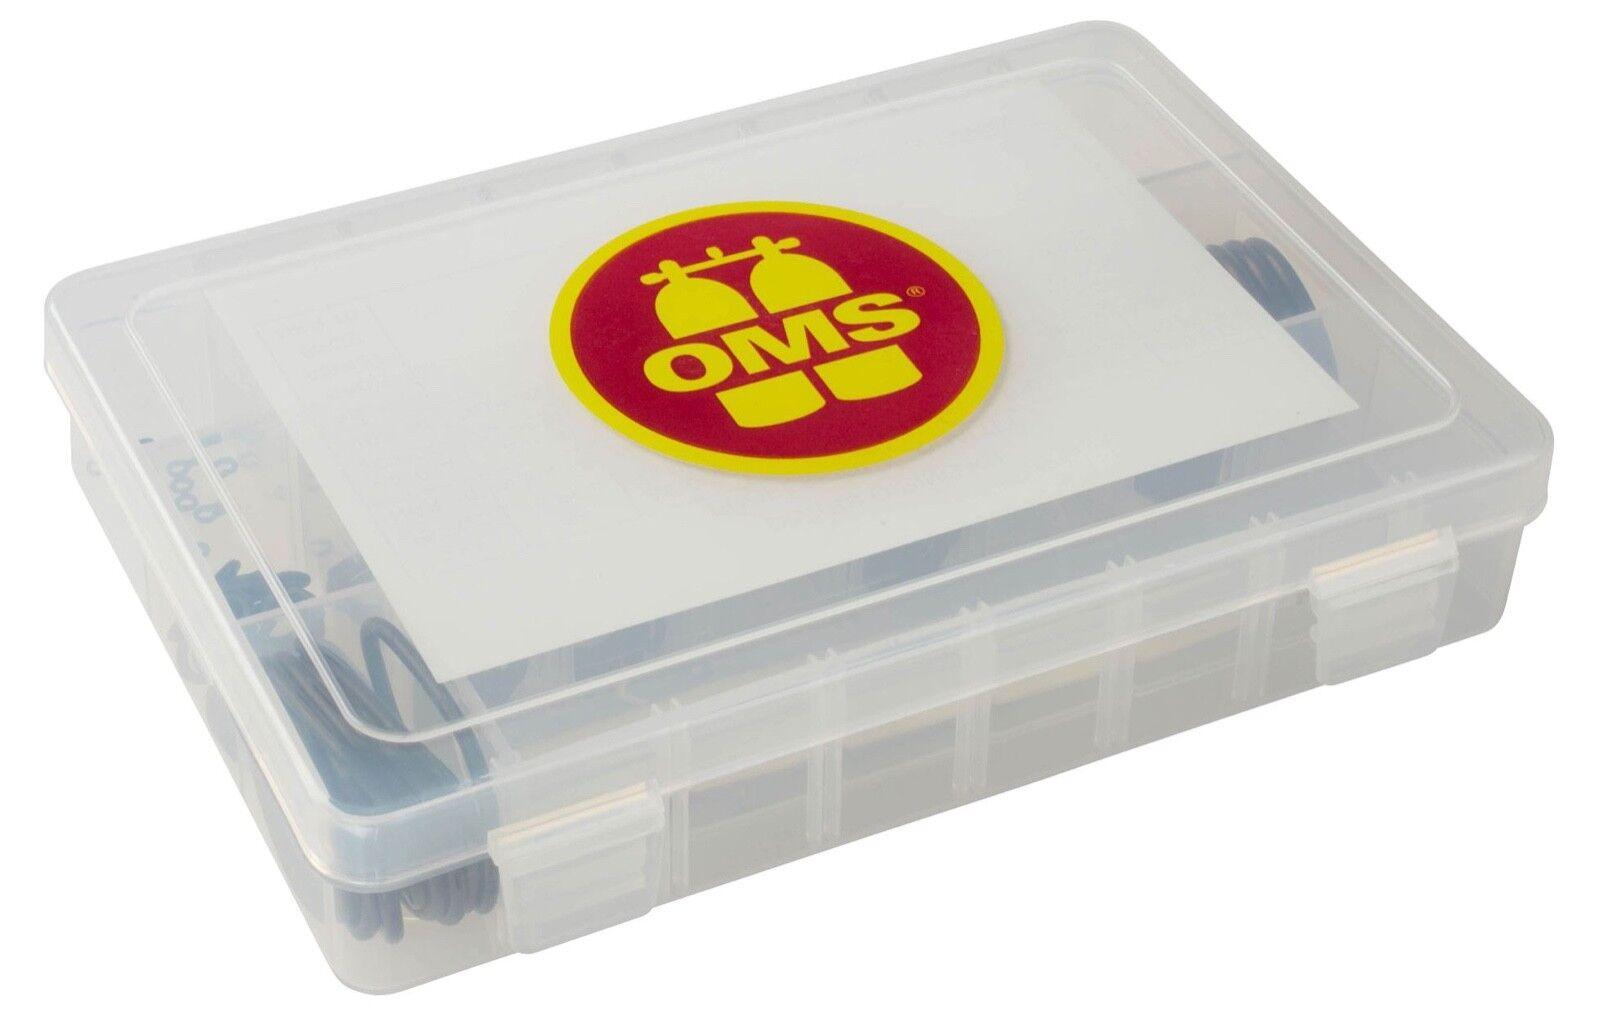 TAUCHFIEBER OMS O-Ring Set für Atemregler, Atemregler, Atemregler, Tauchausrüstung, usw. 7e1eca